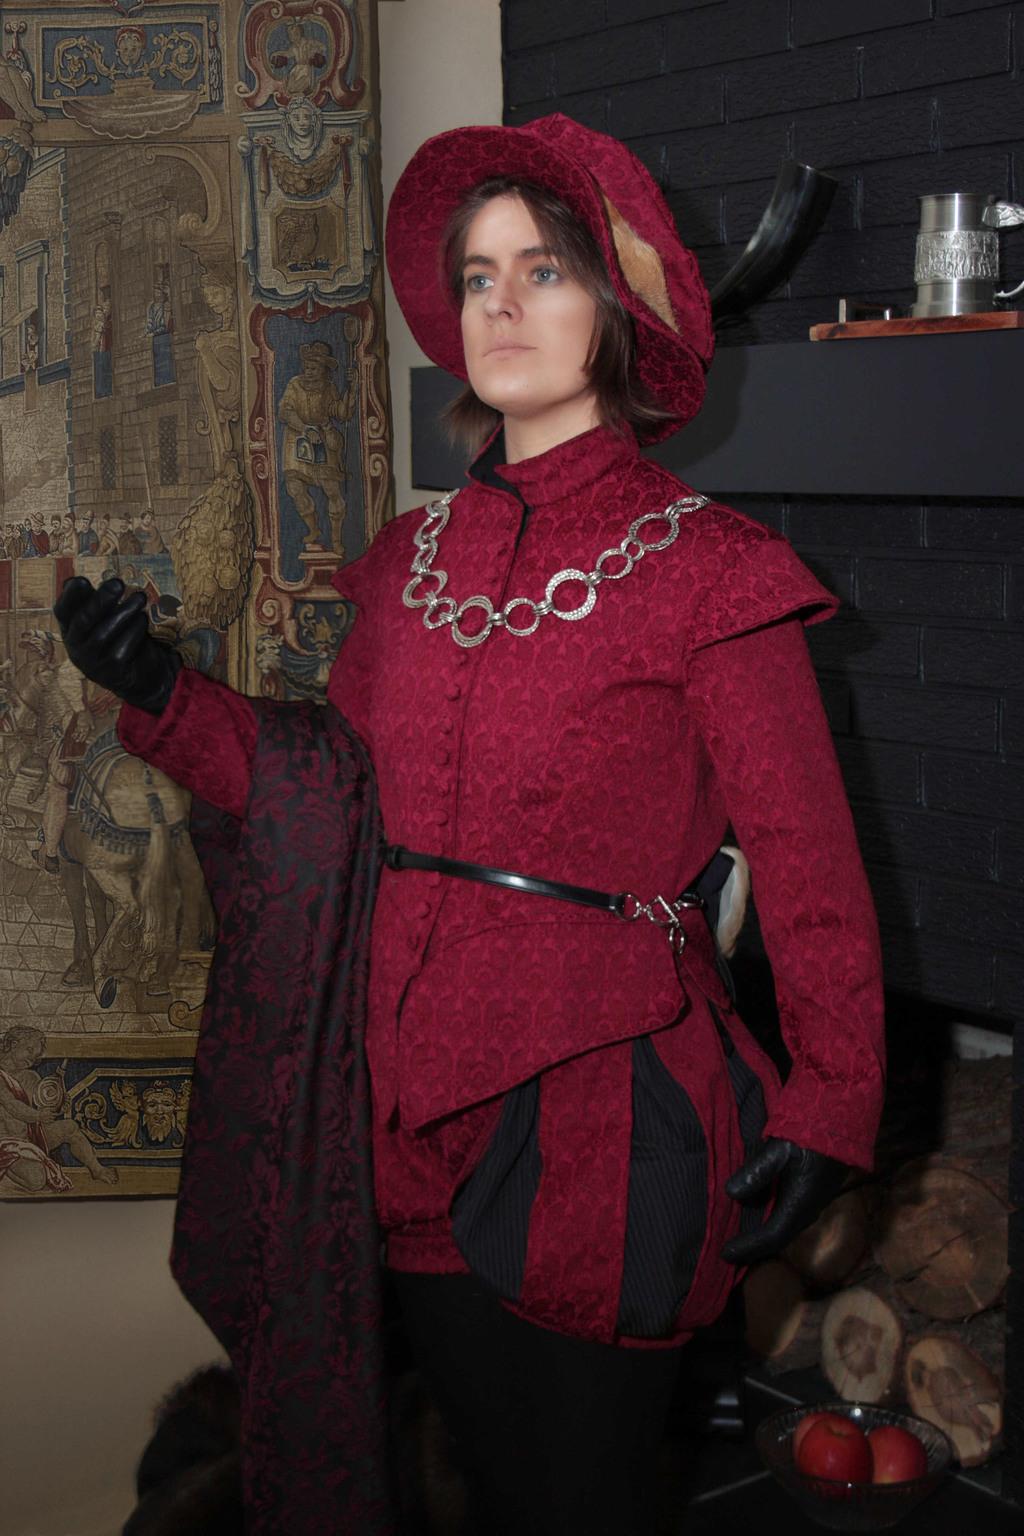 Tudor Prince - Historical cosplay